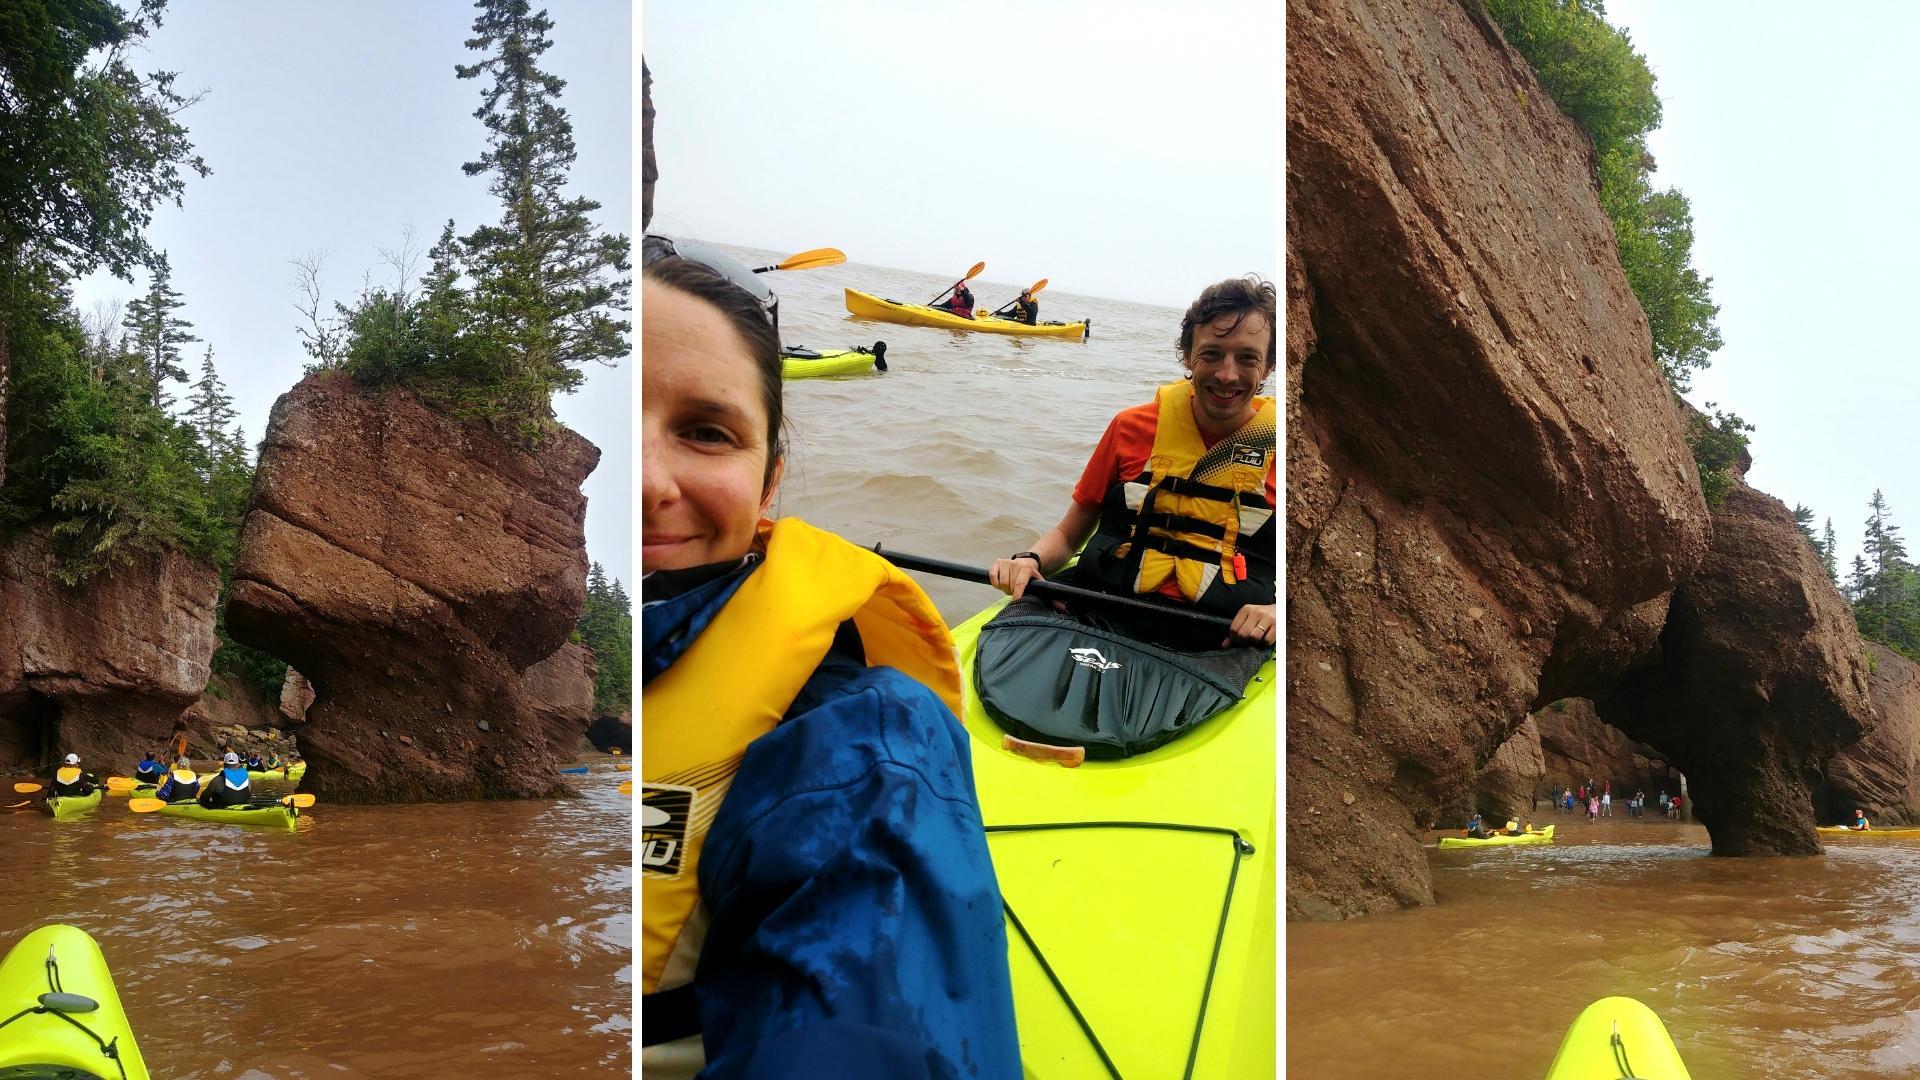 rochers hopewell kayak que voir baie fundy nouveau-brunswick blog voyage road-trip canada arpenter le chemin